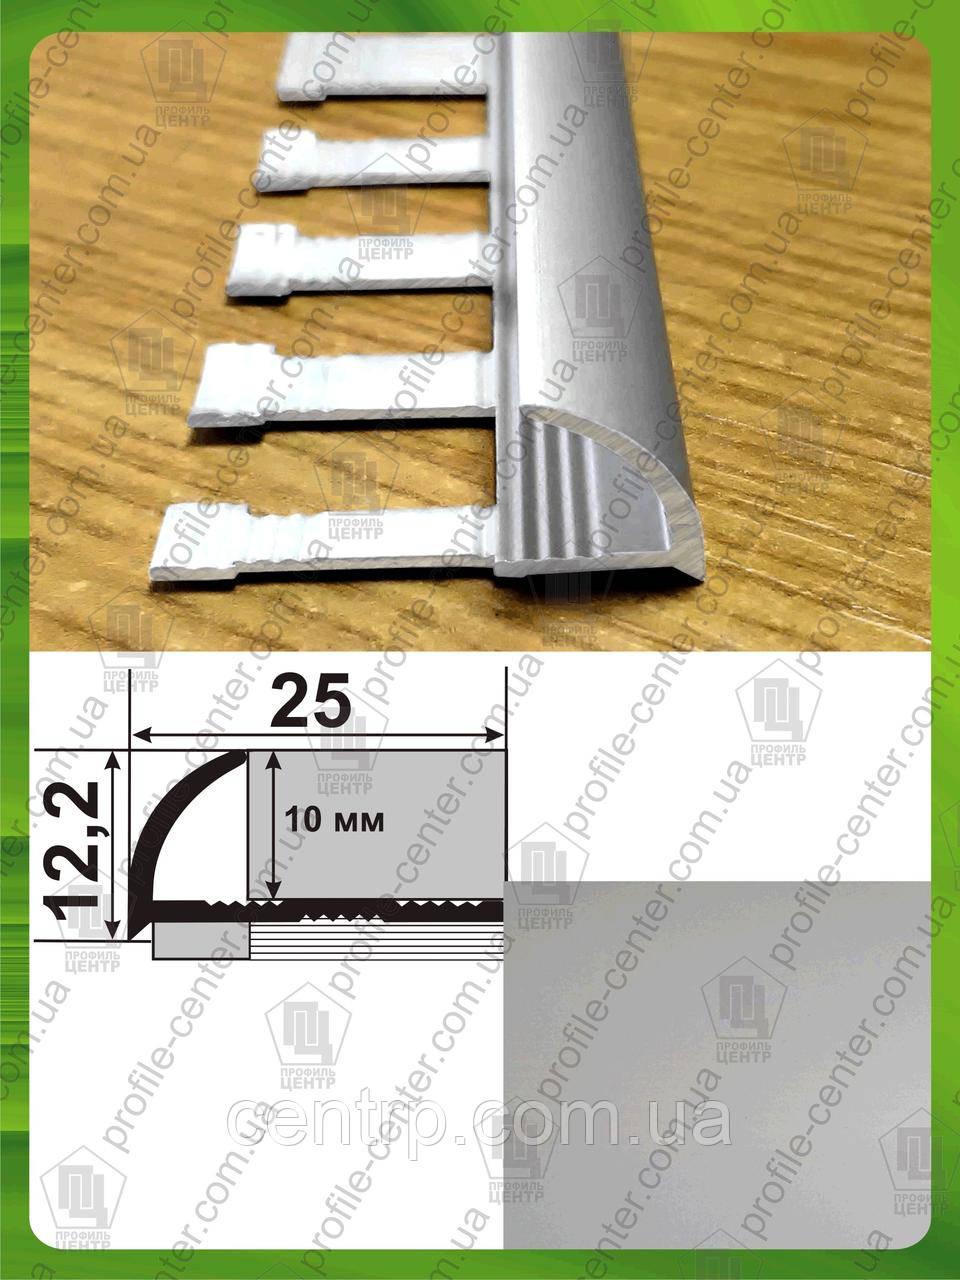 Гибкий наружный угол для плитки 9 мм L-2.7м. НАП 10 Г